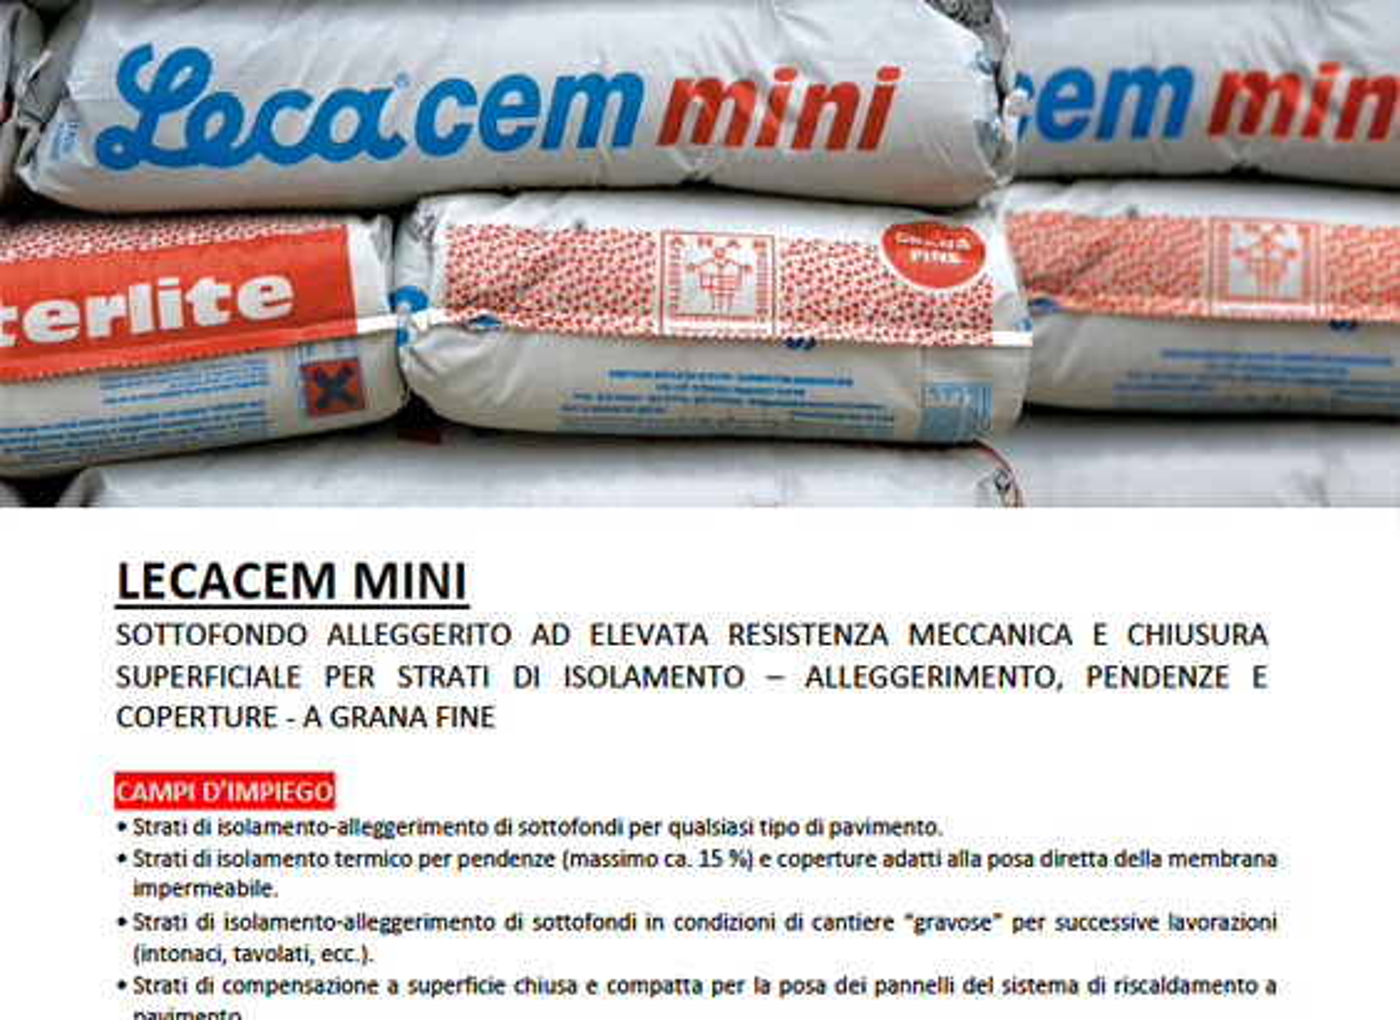 scheda-tecnica-lecacem-mini-P6